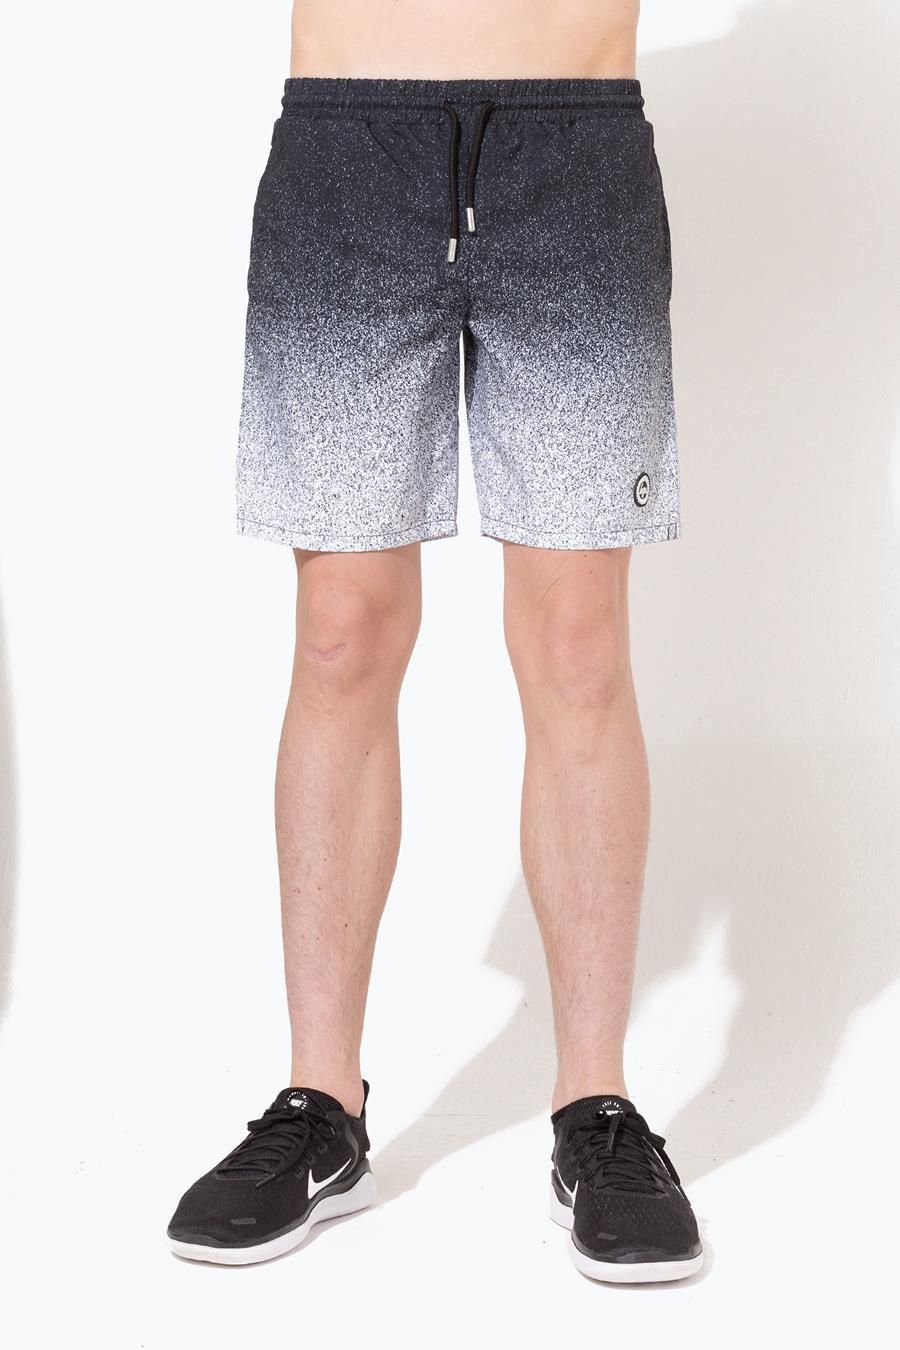 Hype Black Speckle Fade Kids Swim Shorts